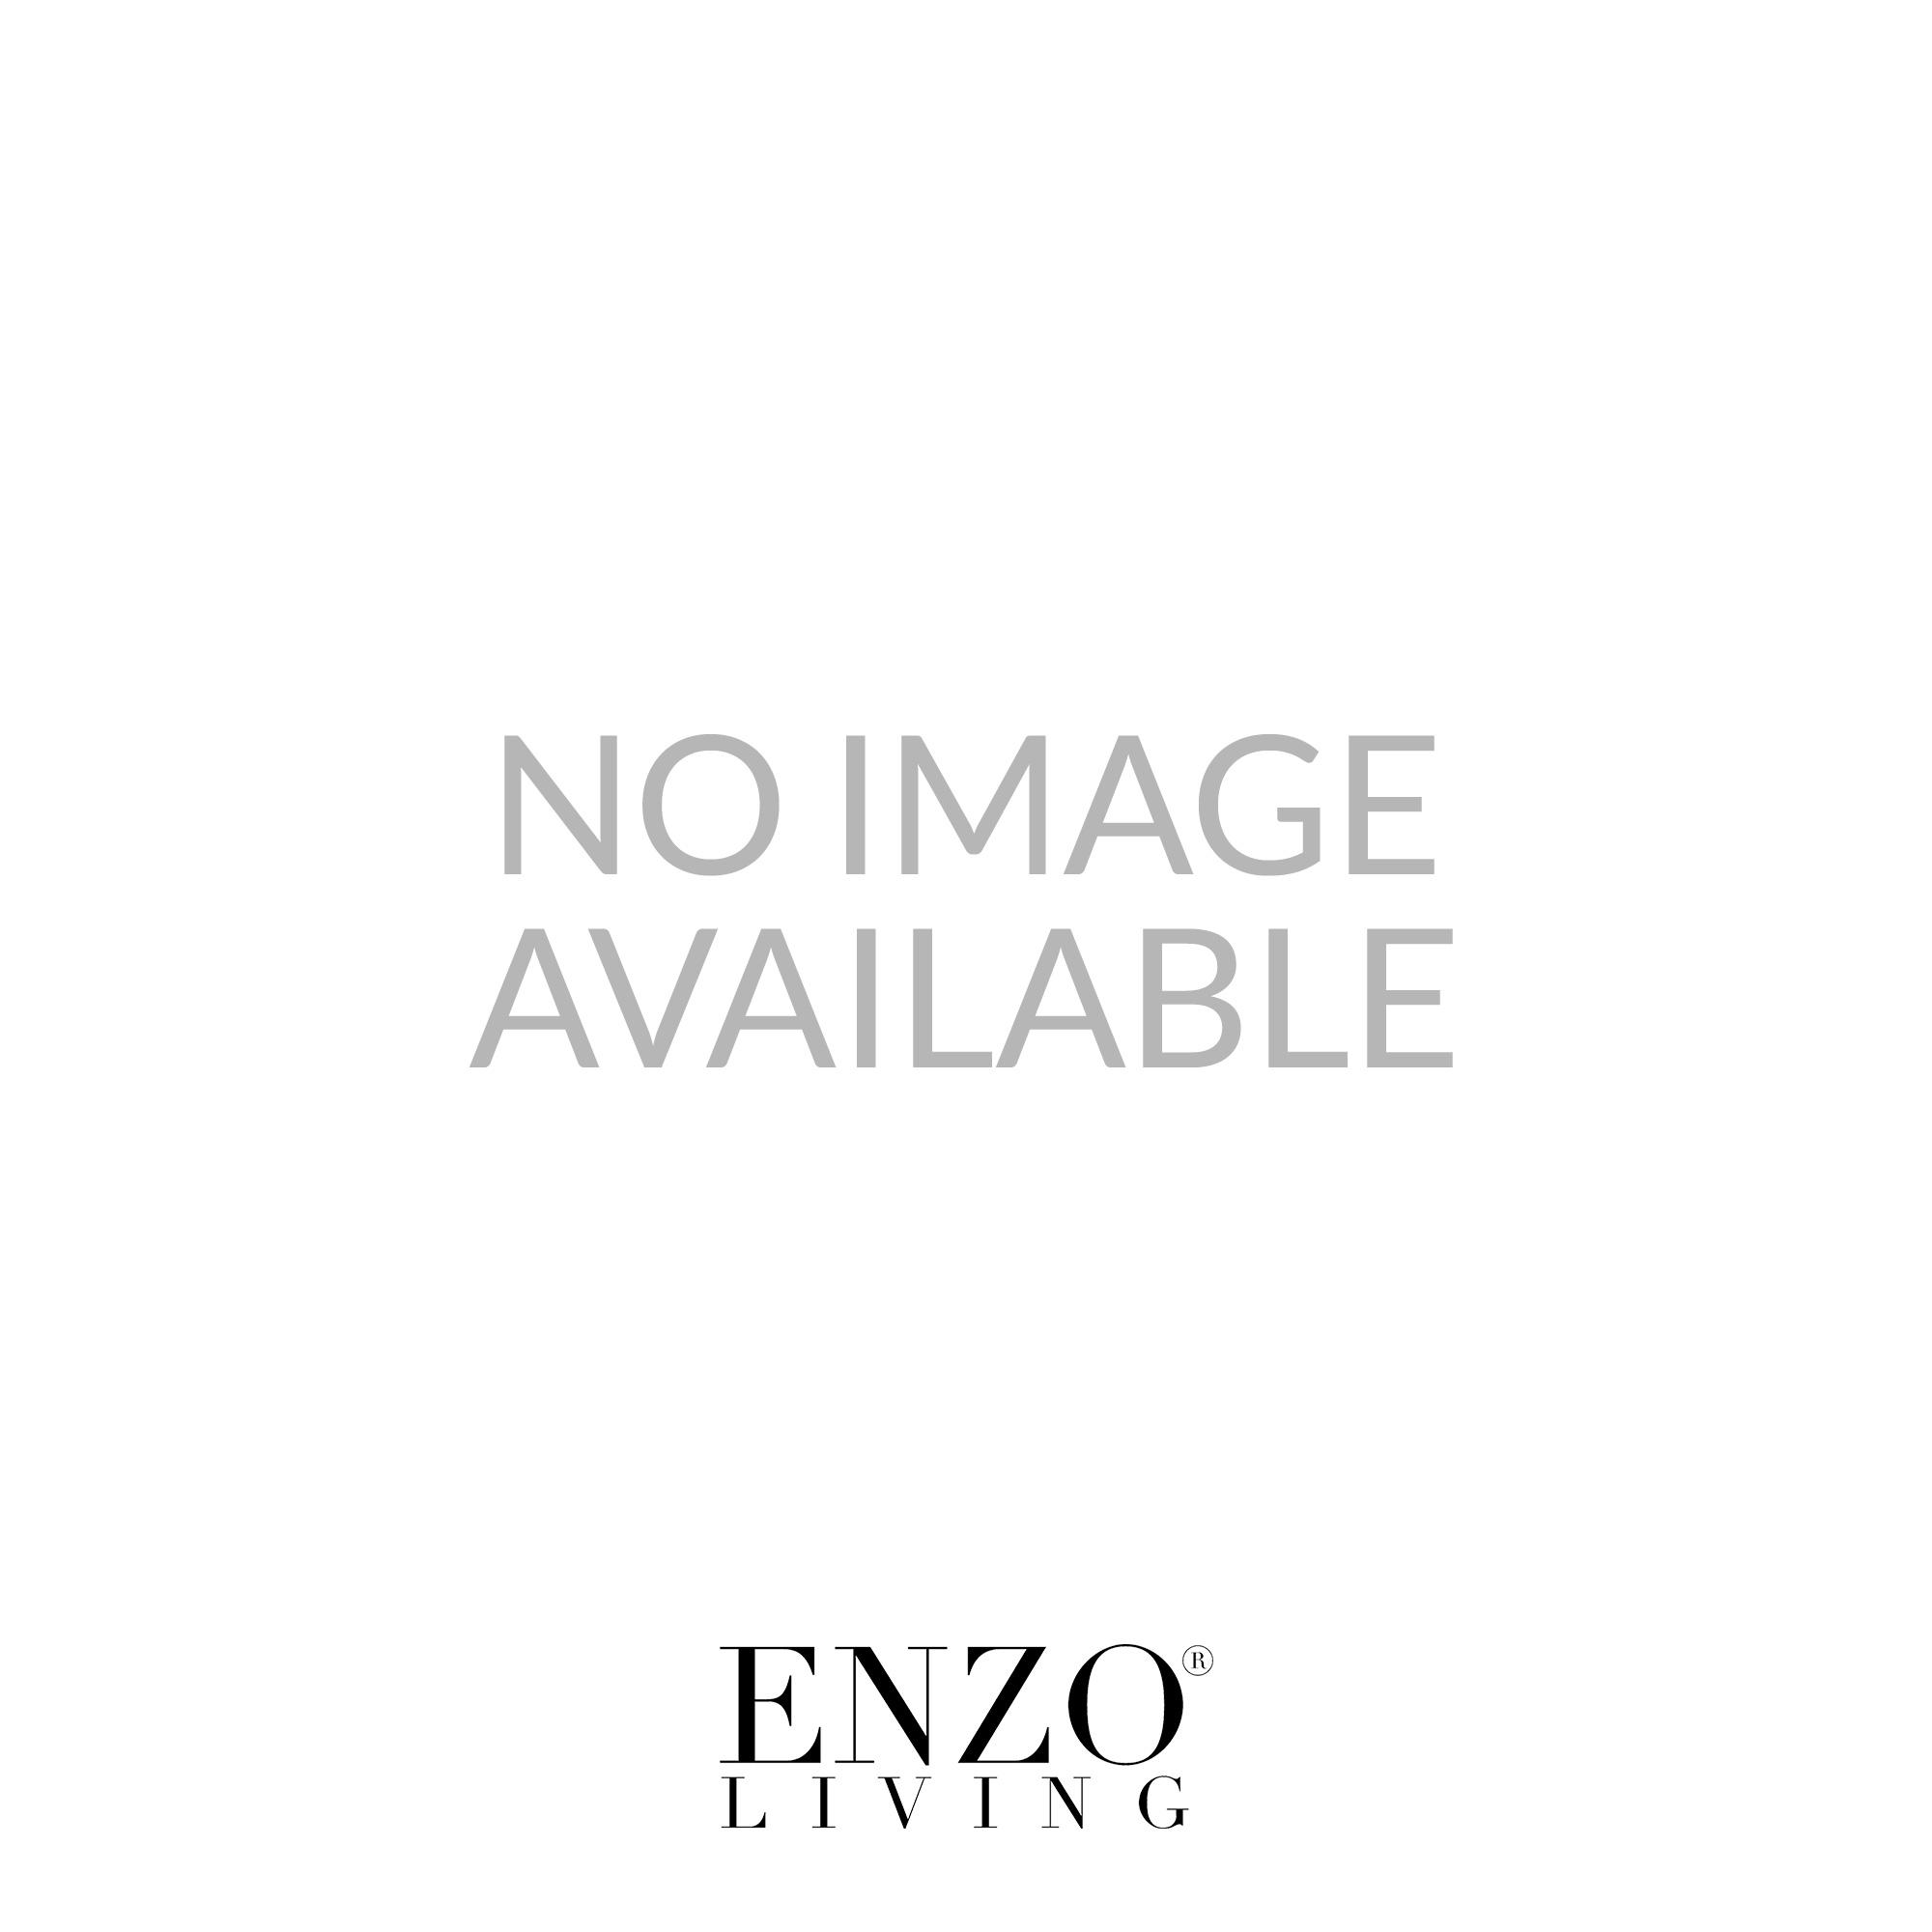 Eglo 82305 Slim 1 Light Modern Table Lamp White Frosted Glass and Matt Nickel Finish